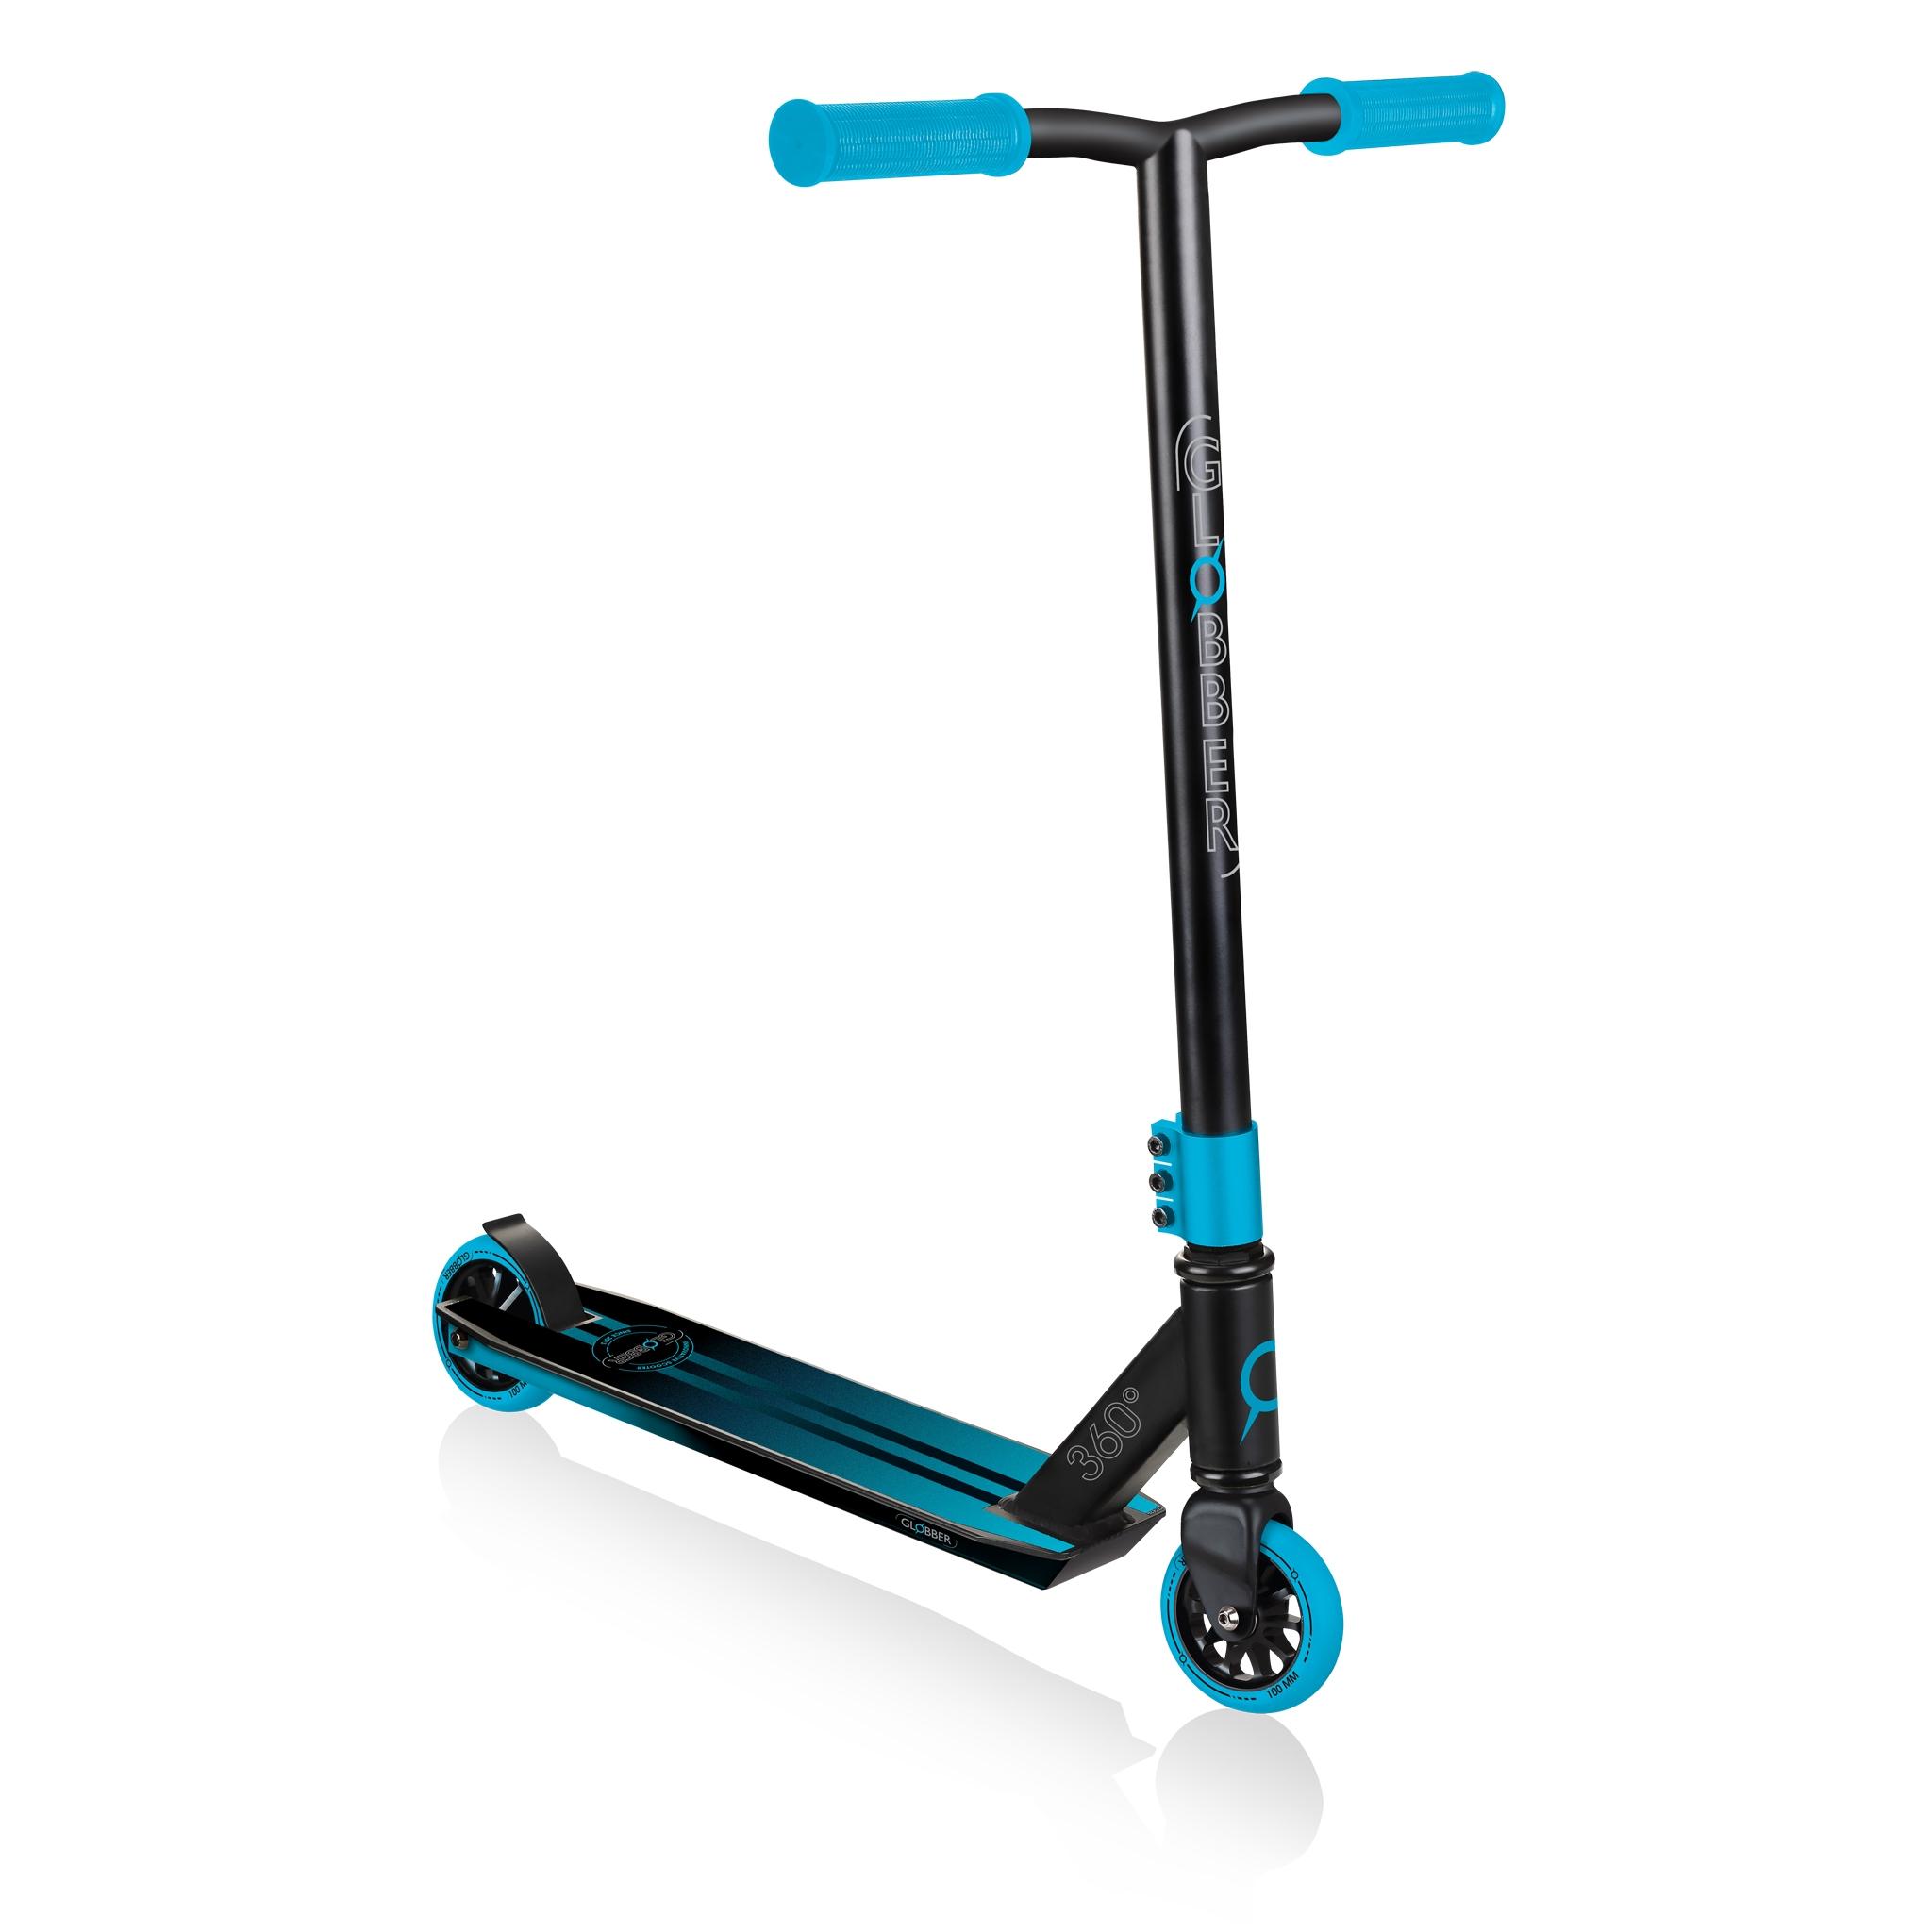 stunt-scooter-for-kids-Globber-GS360 0